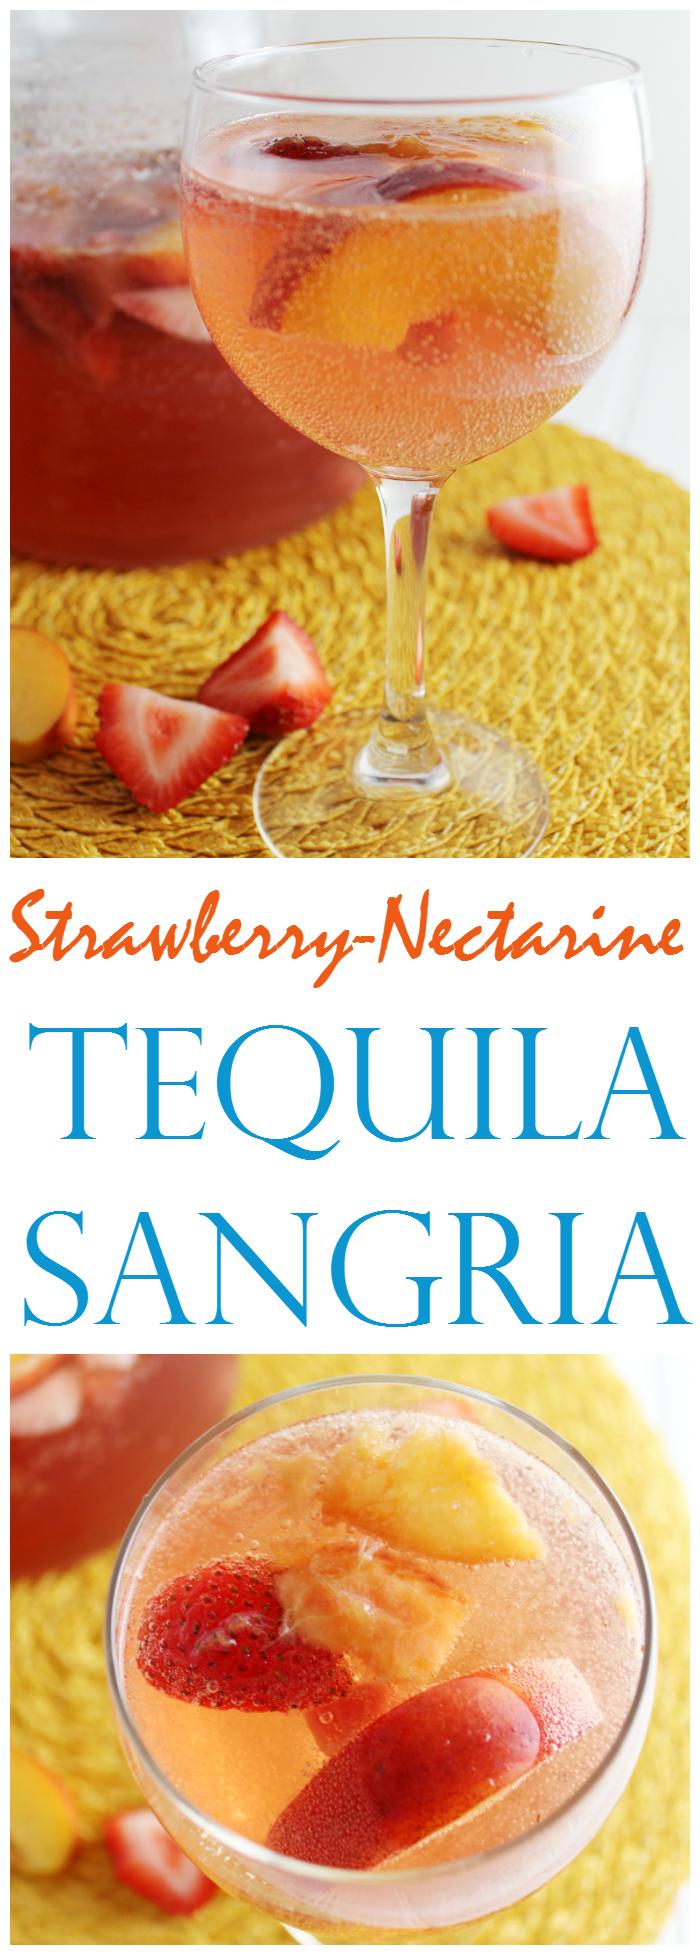 Strawberry-Nectarine Tequila Sangria #tequiladrinks